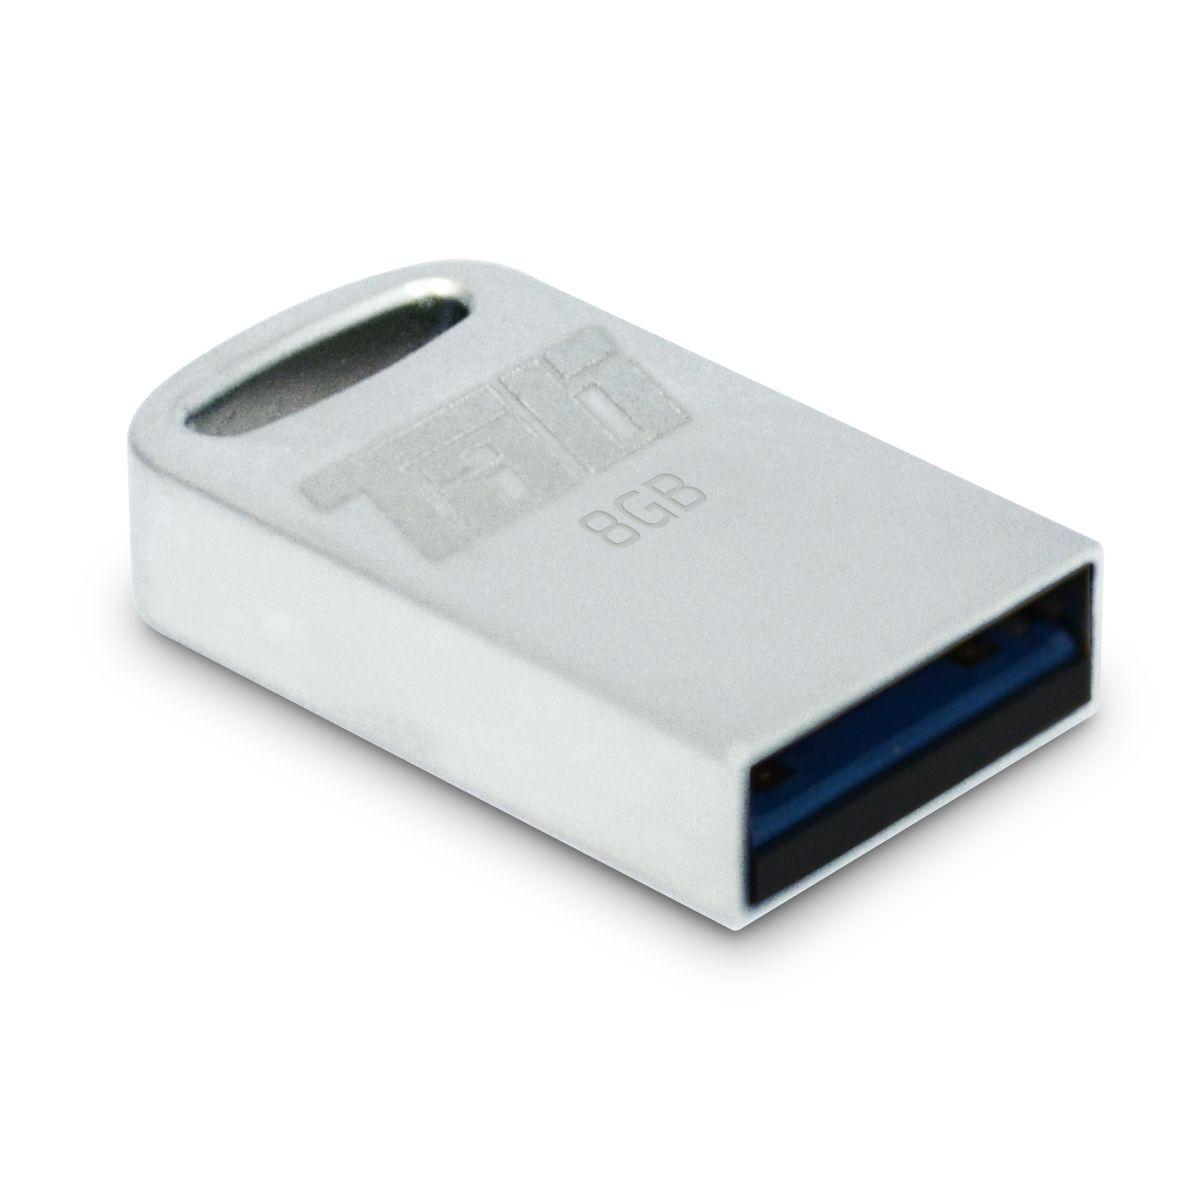 Pen Drive 8GB TAB USB 3.0 em Aluminio PSF8GTAB3USB - Patriot